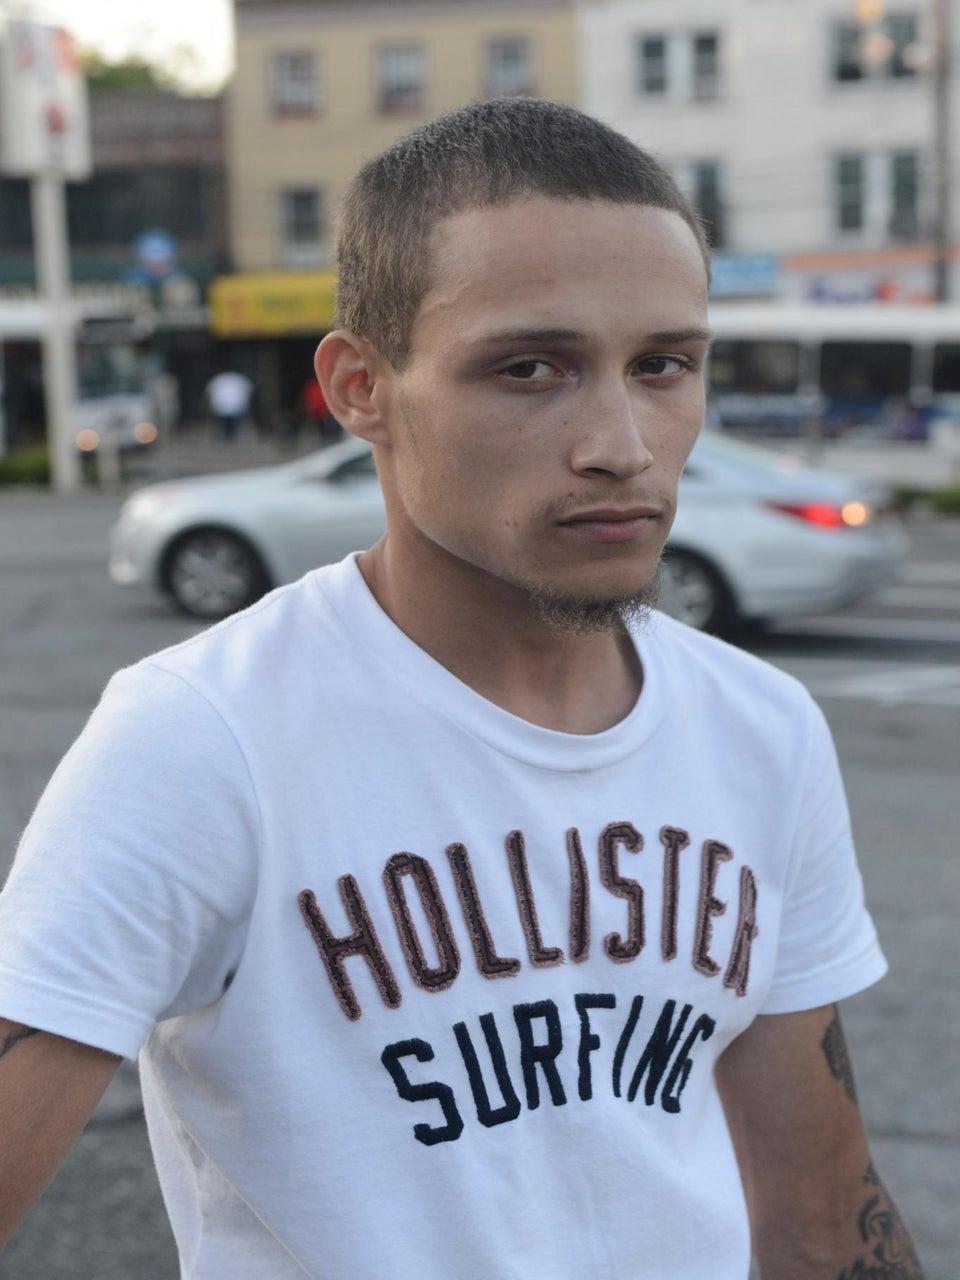 Man Who Filmed Eric Garner's Death Released From Jail